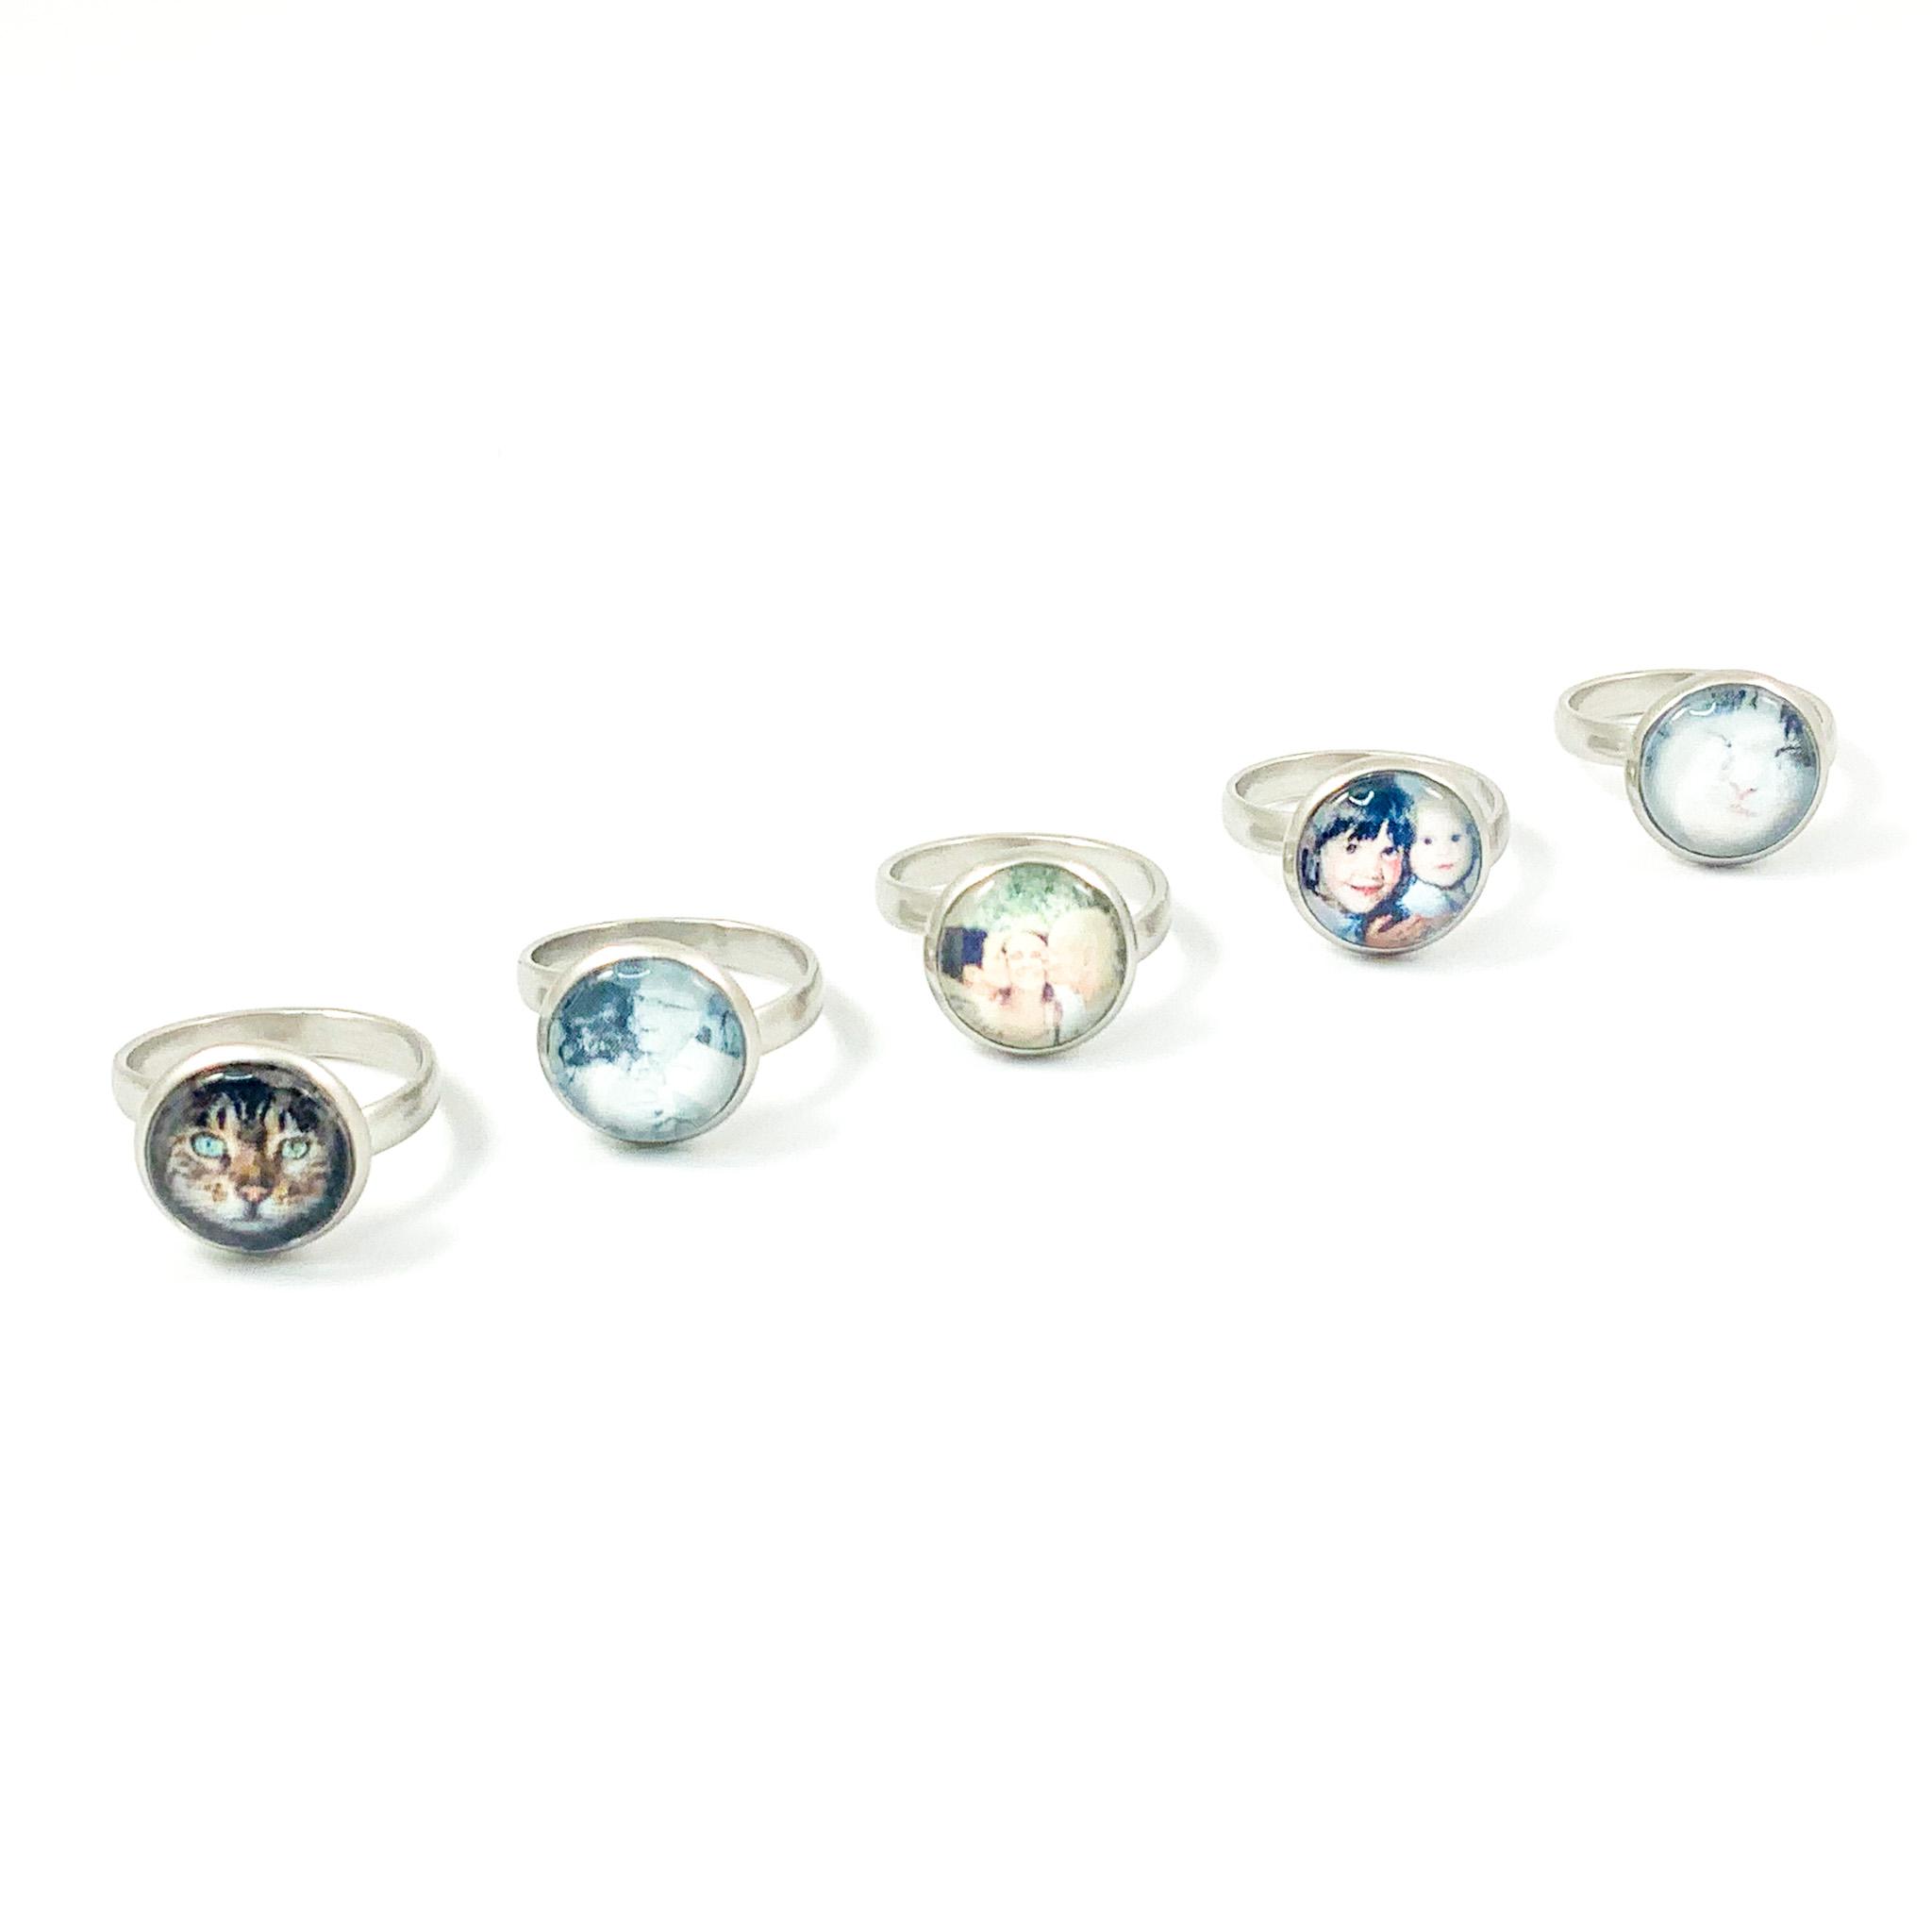 Ring met foto rond sieraden ring sype 2 stainless steel rond